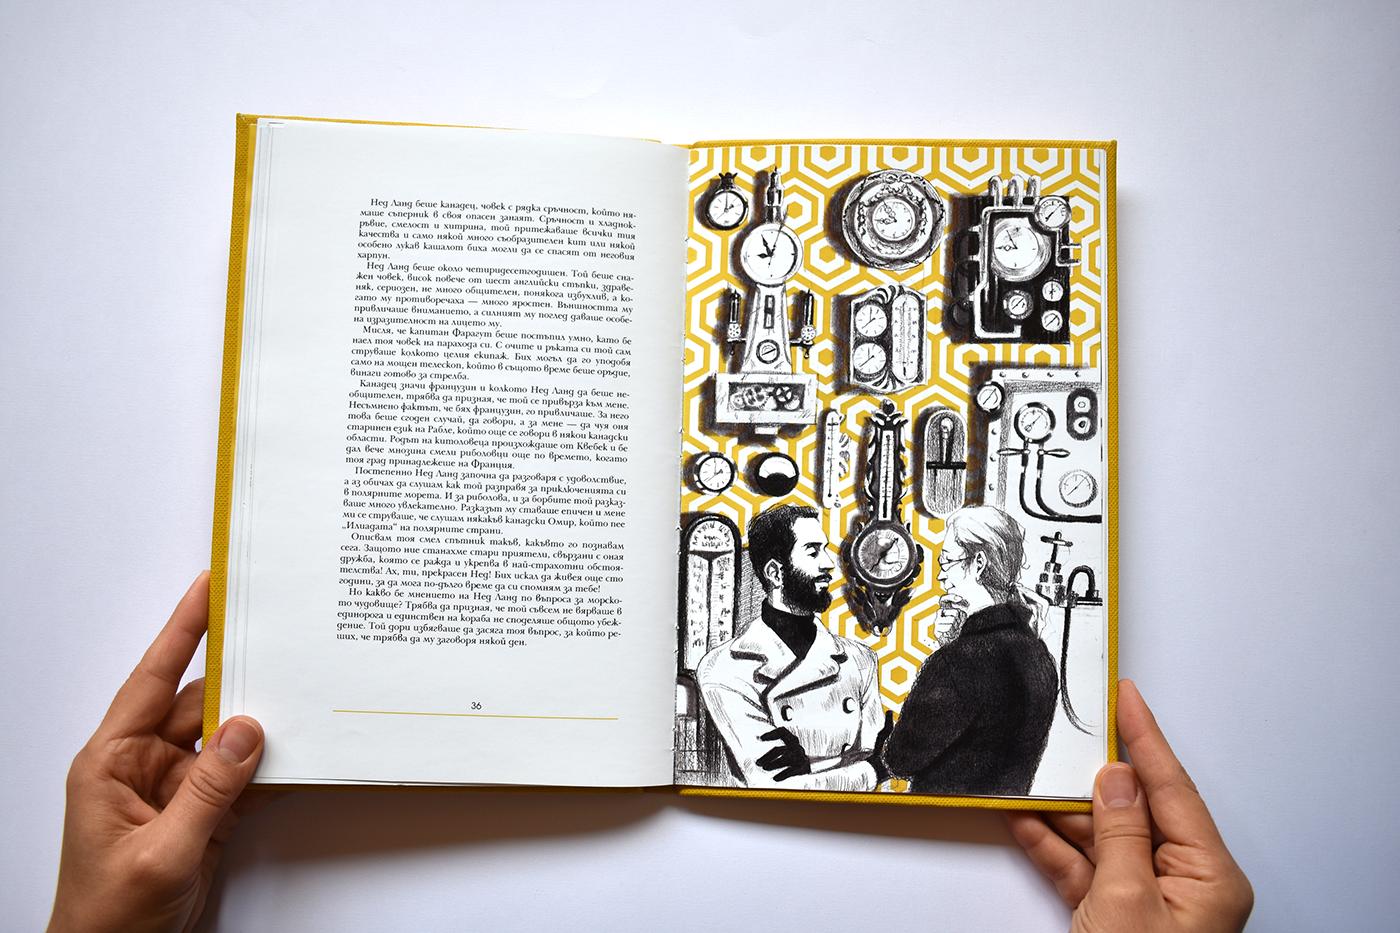 book Bookbinding illustrations Nemo Classic scientific illustrations ILLUSTRATION  heavydiver yellow pencil